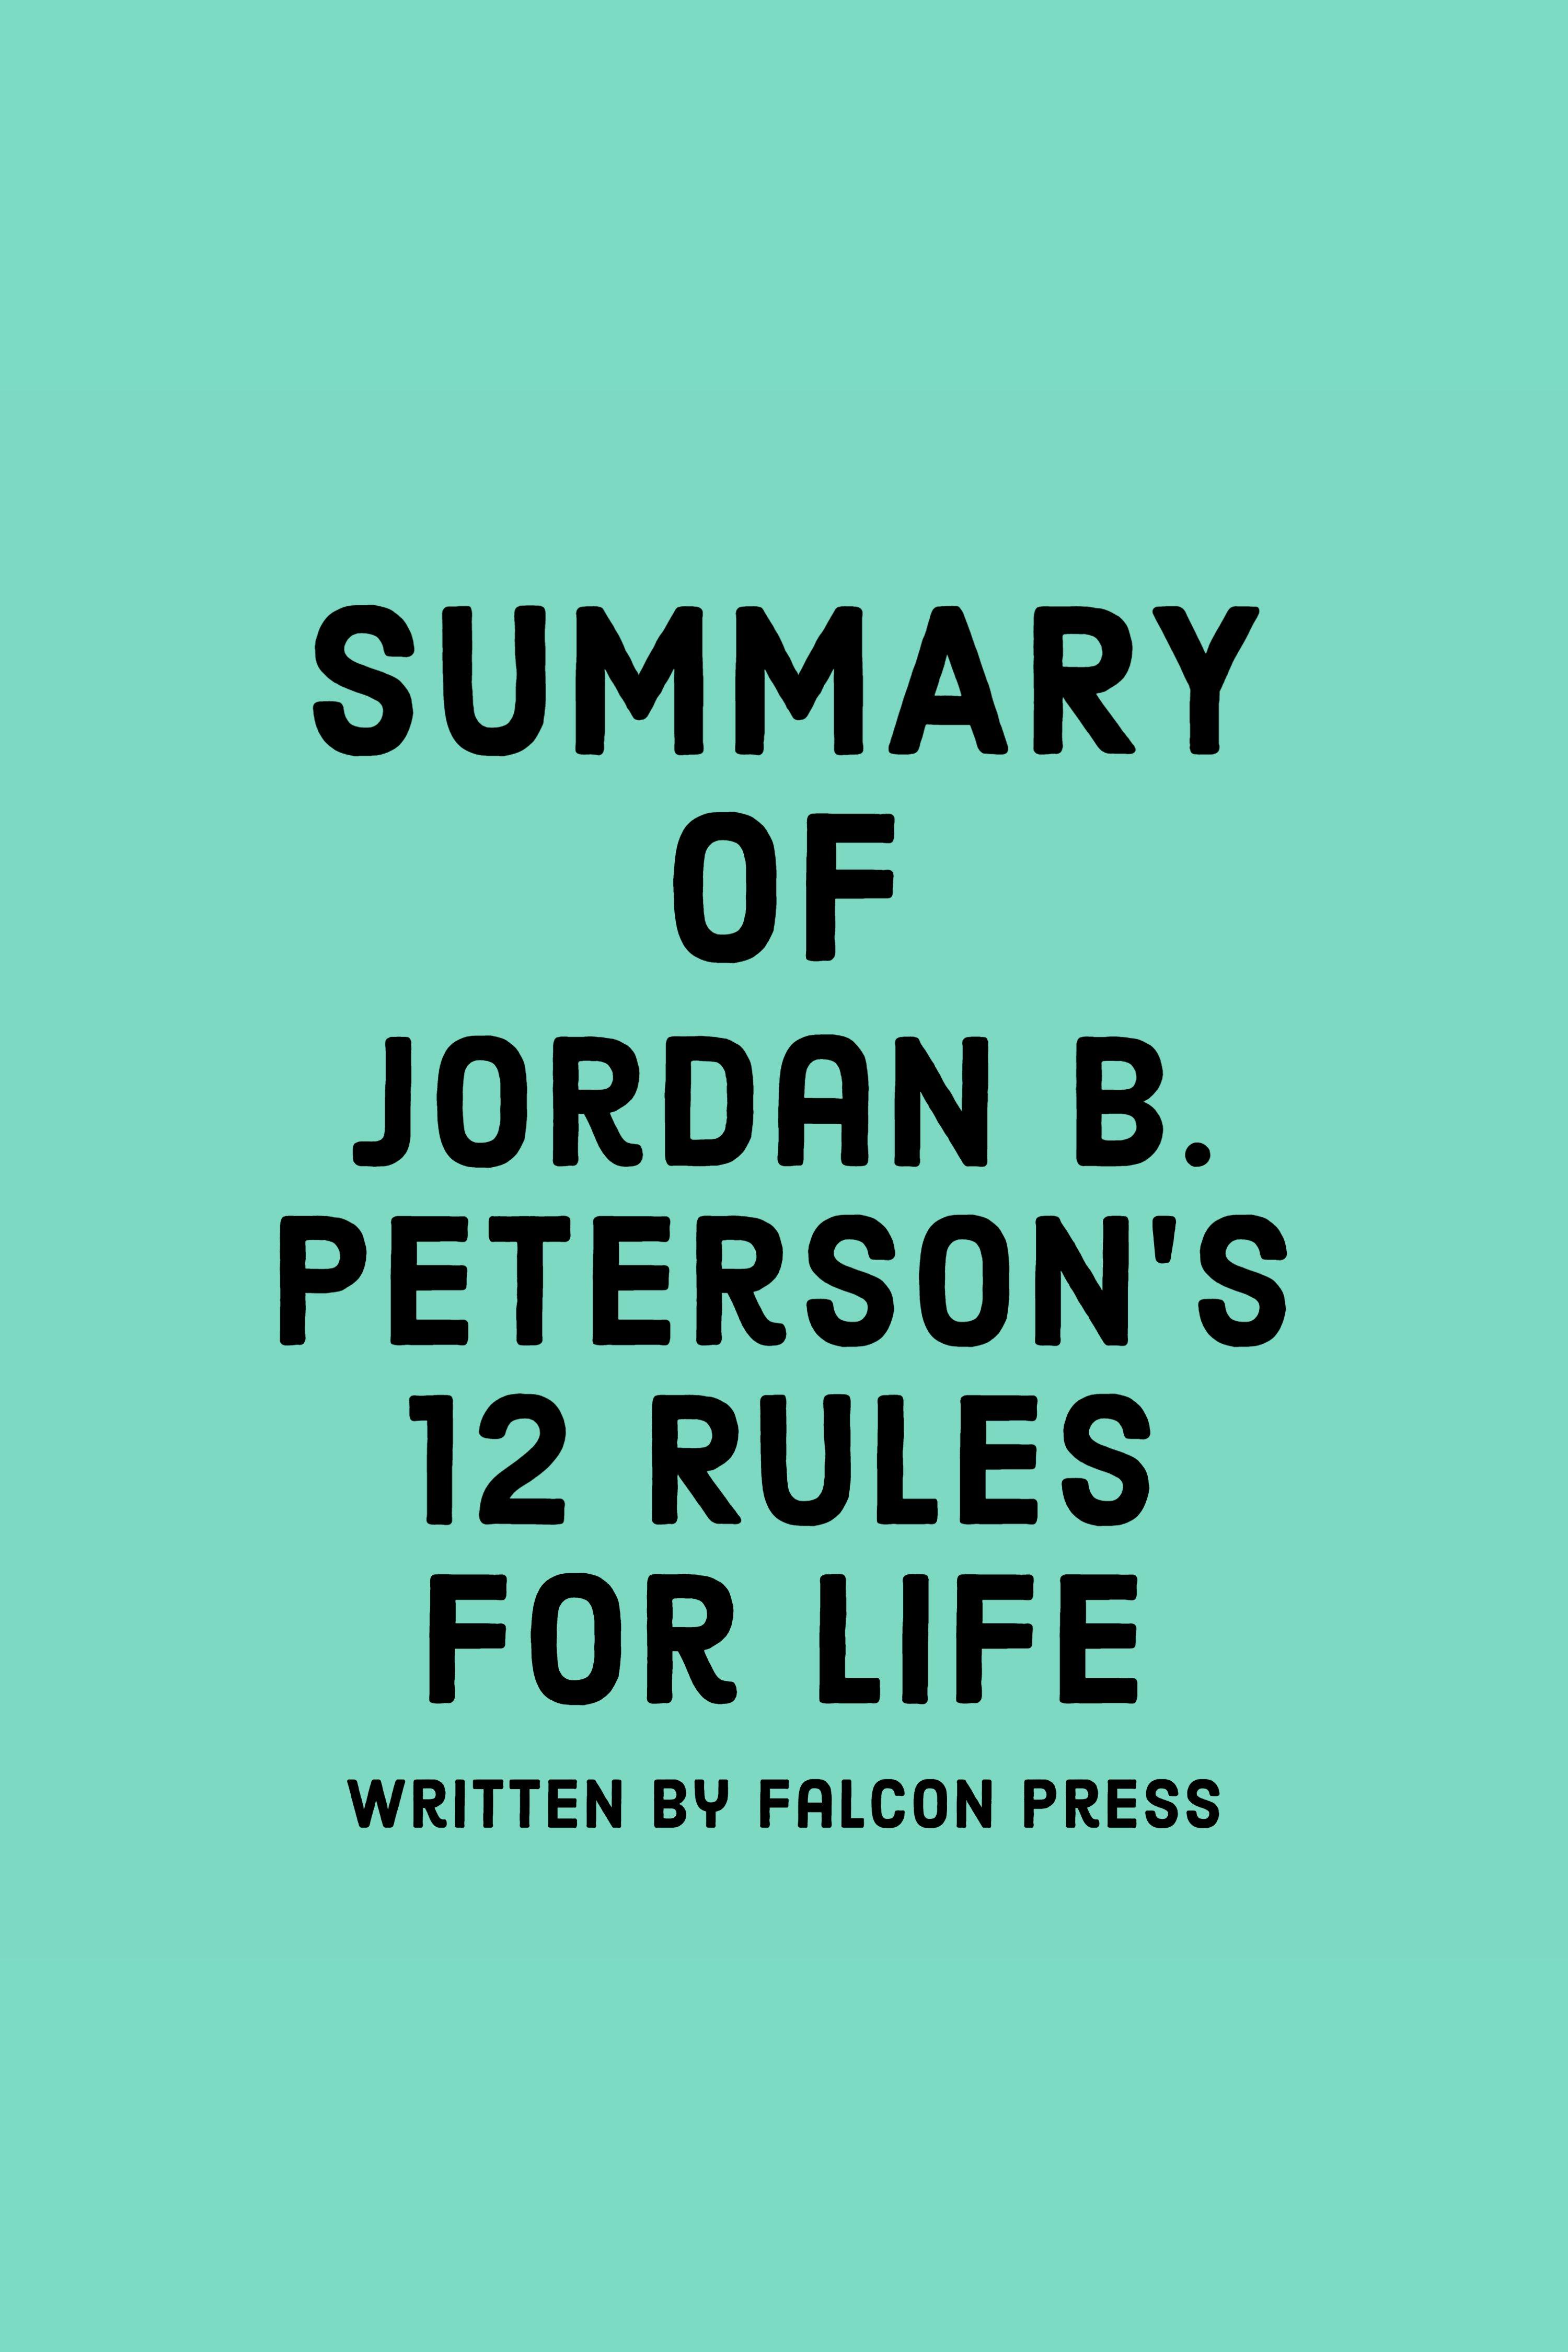 Esta es la portada del audiolibro Summary of Jordan B. Peterson's 12 Rules for Life